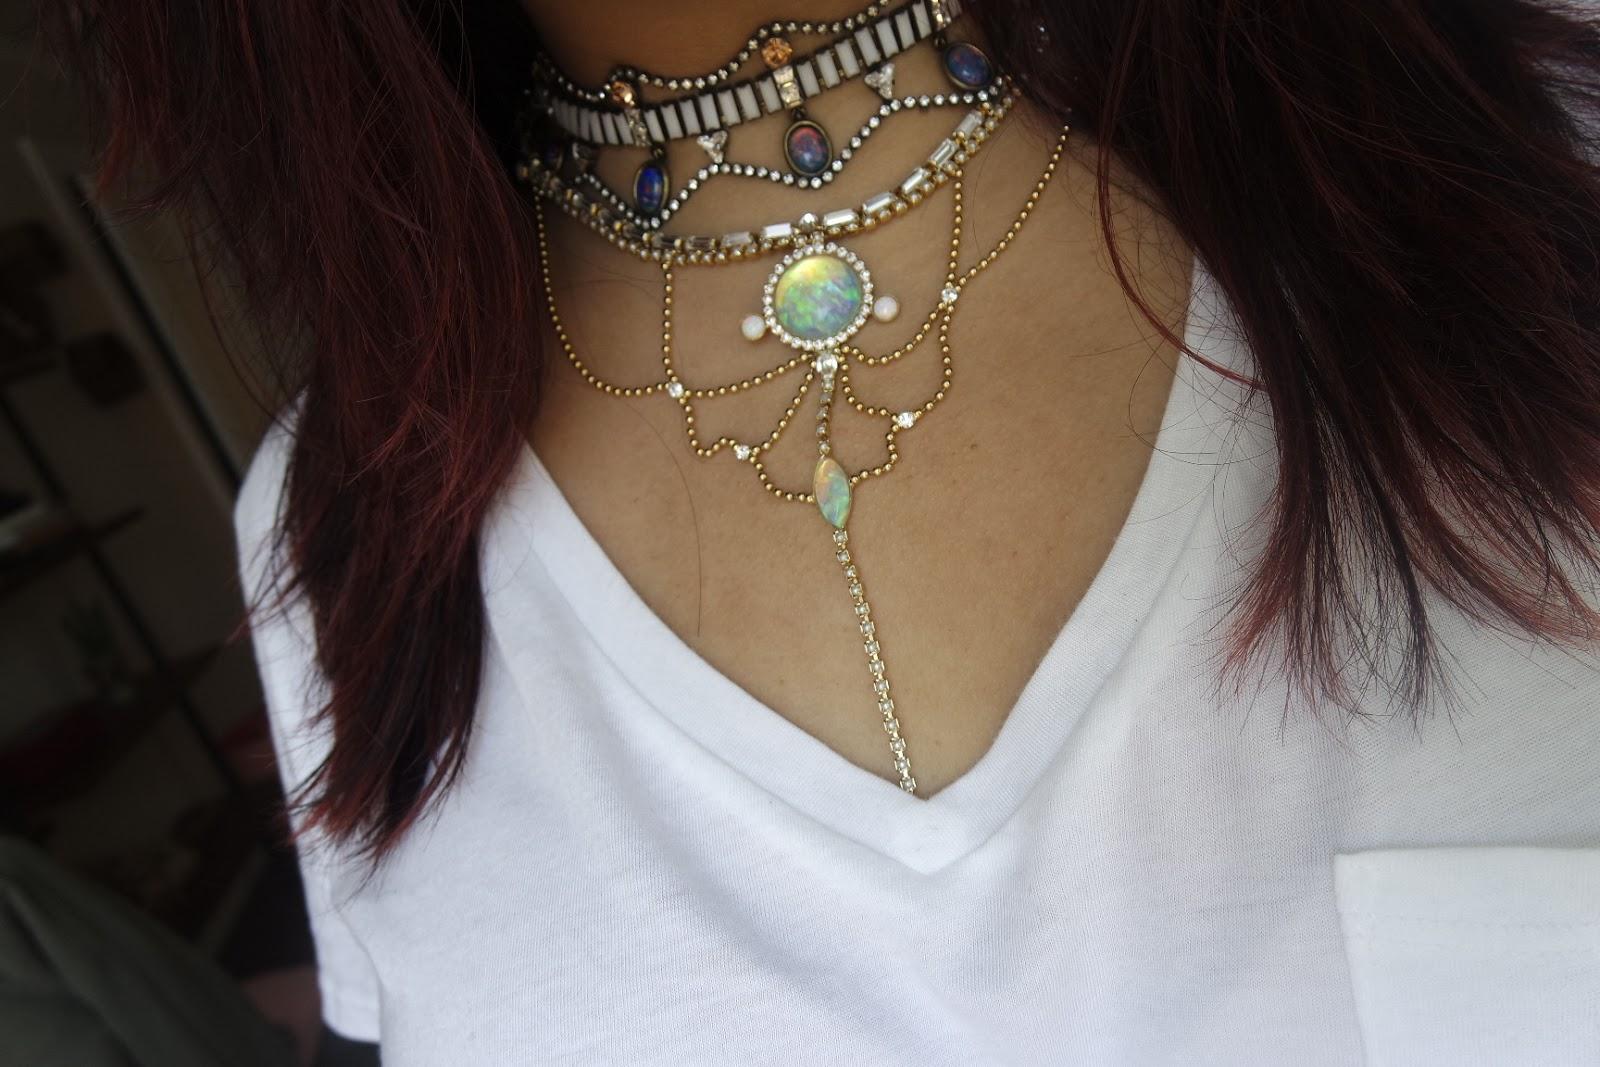 Trend Spotlight: Choker Necklaces